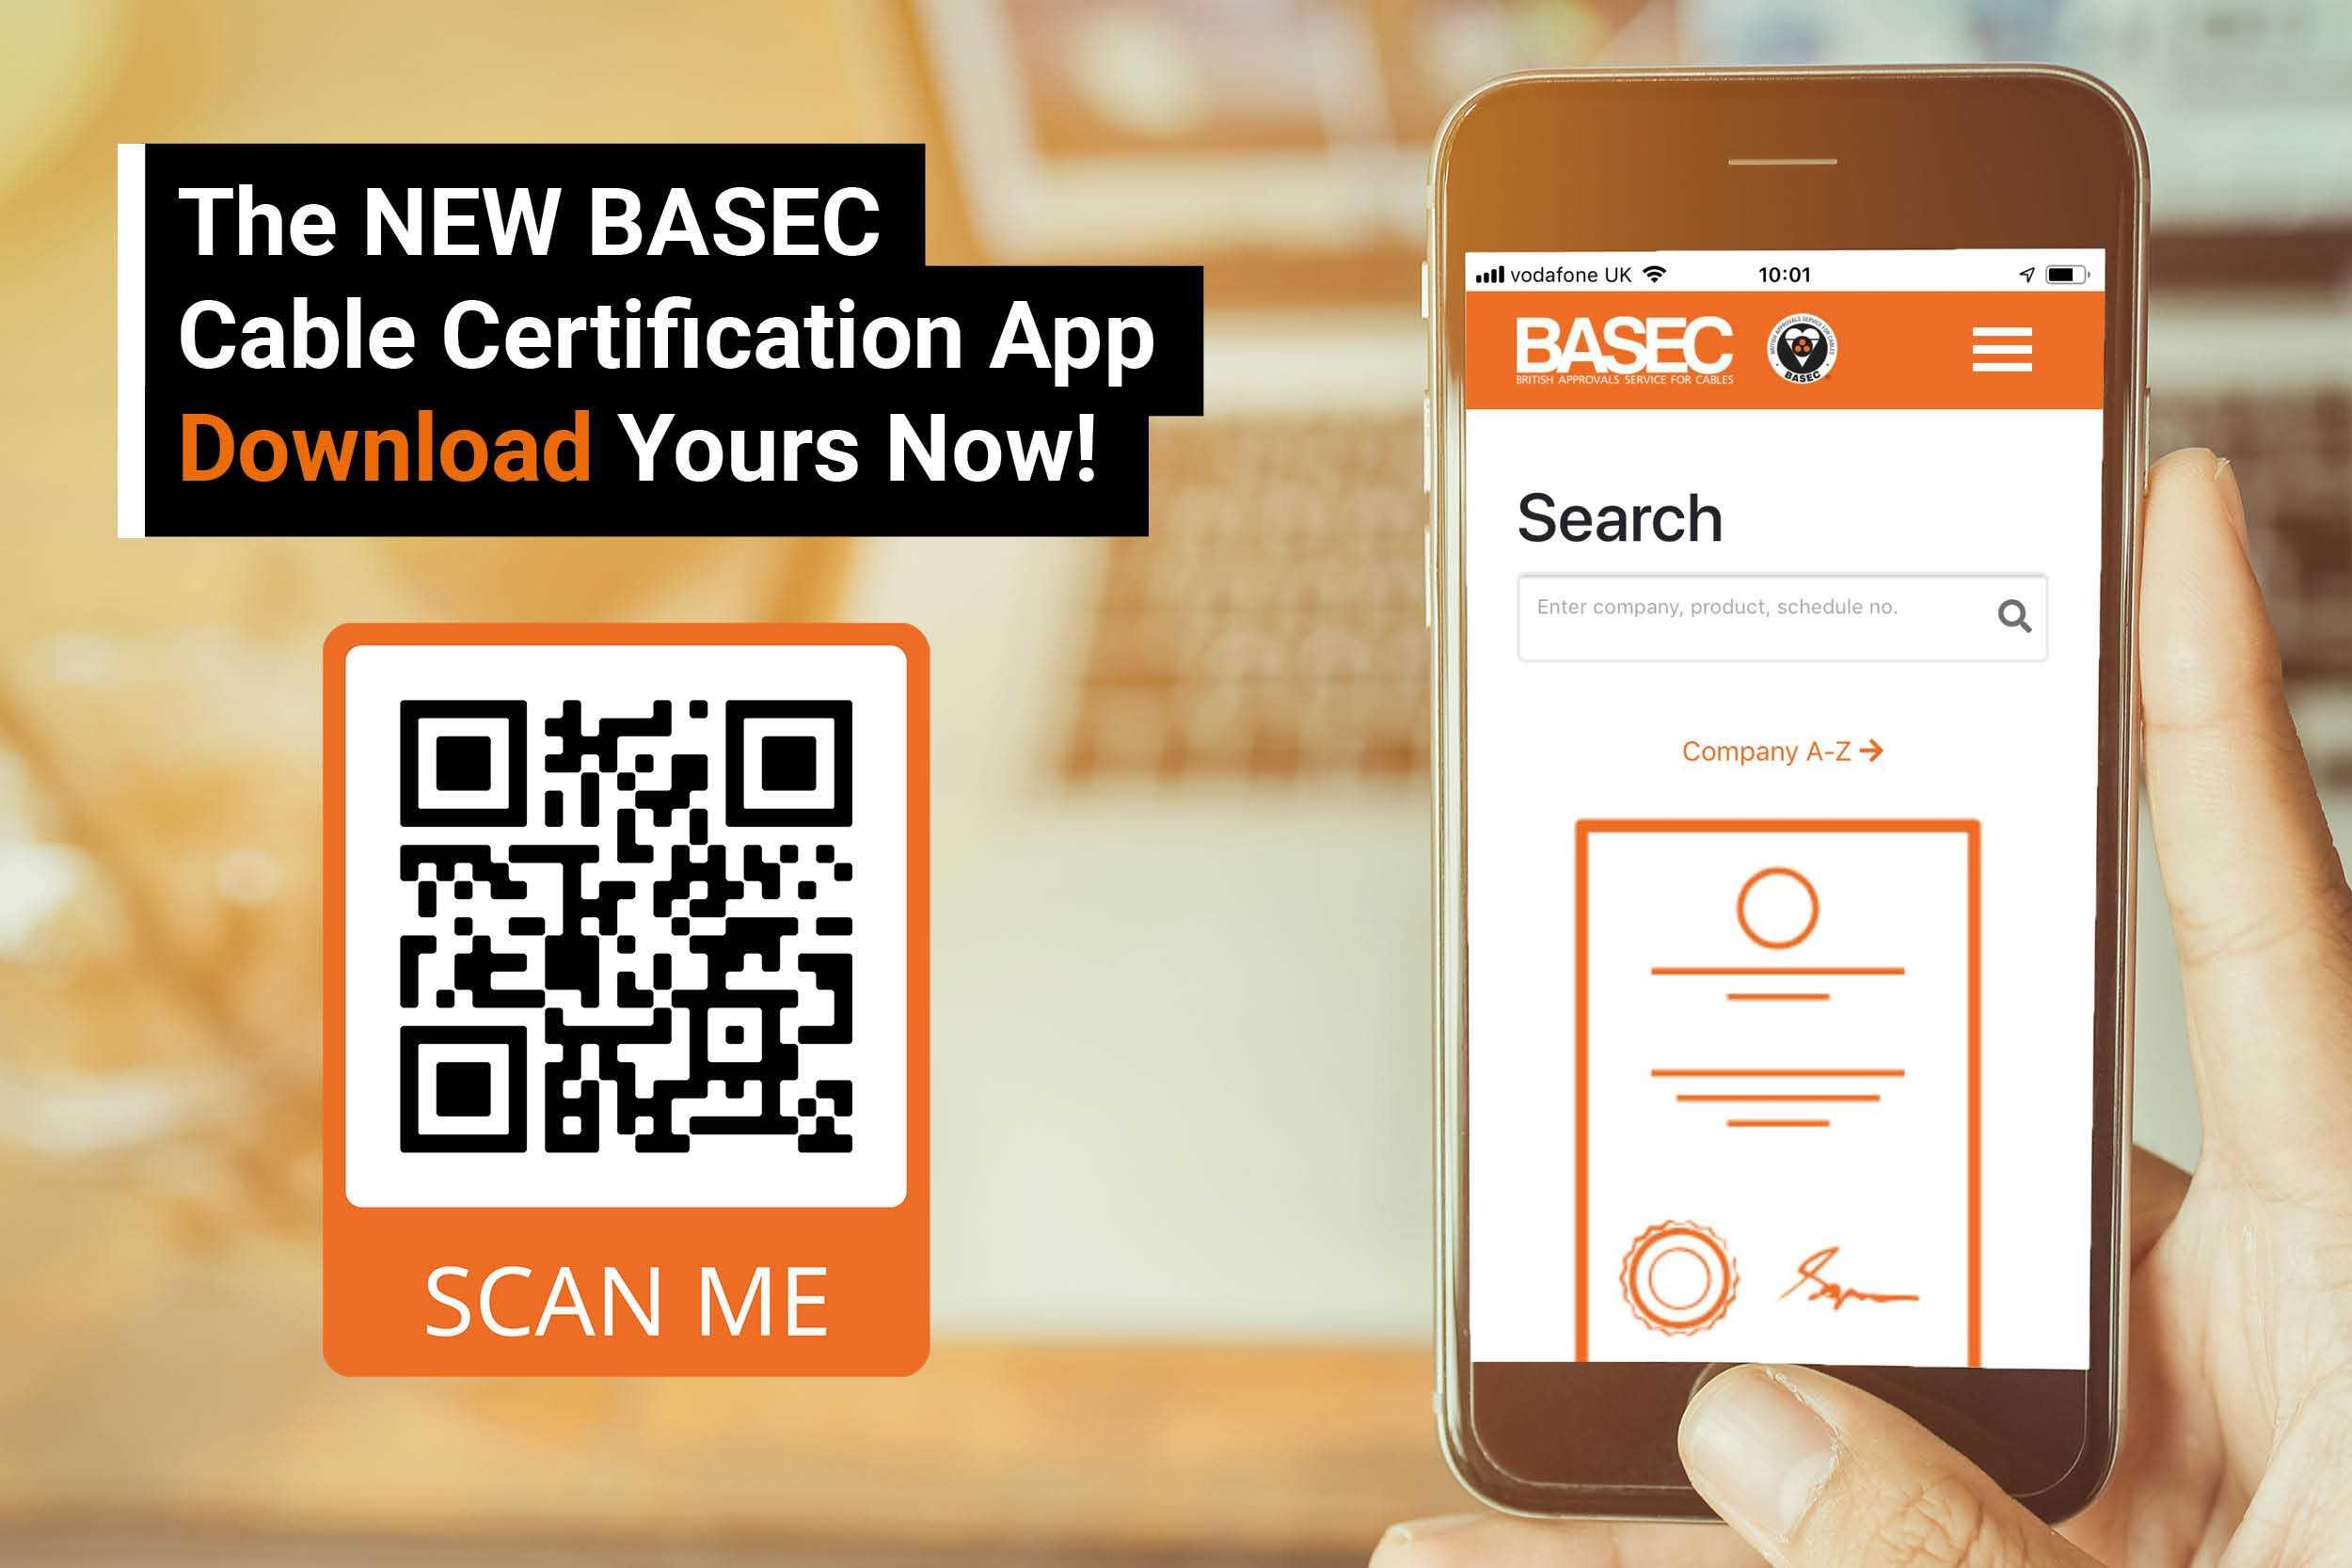 Download the BASEC Certification App